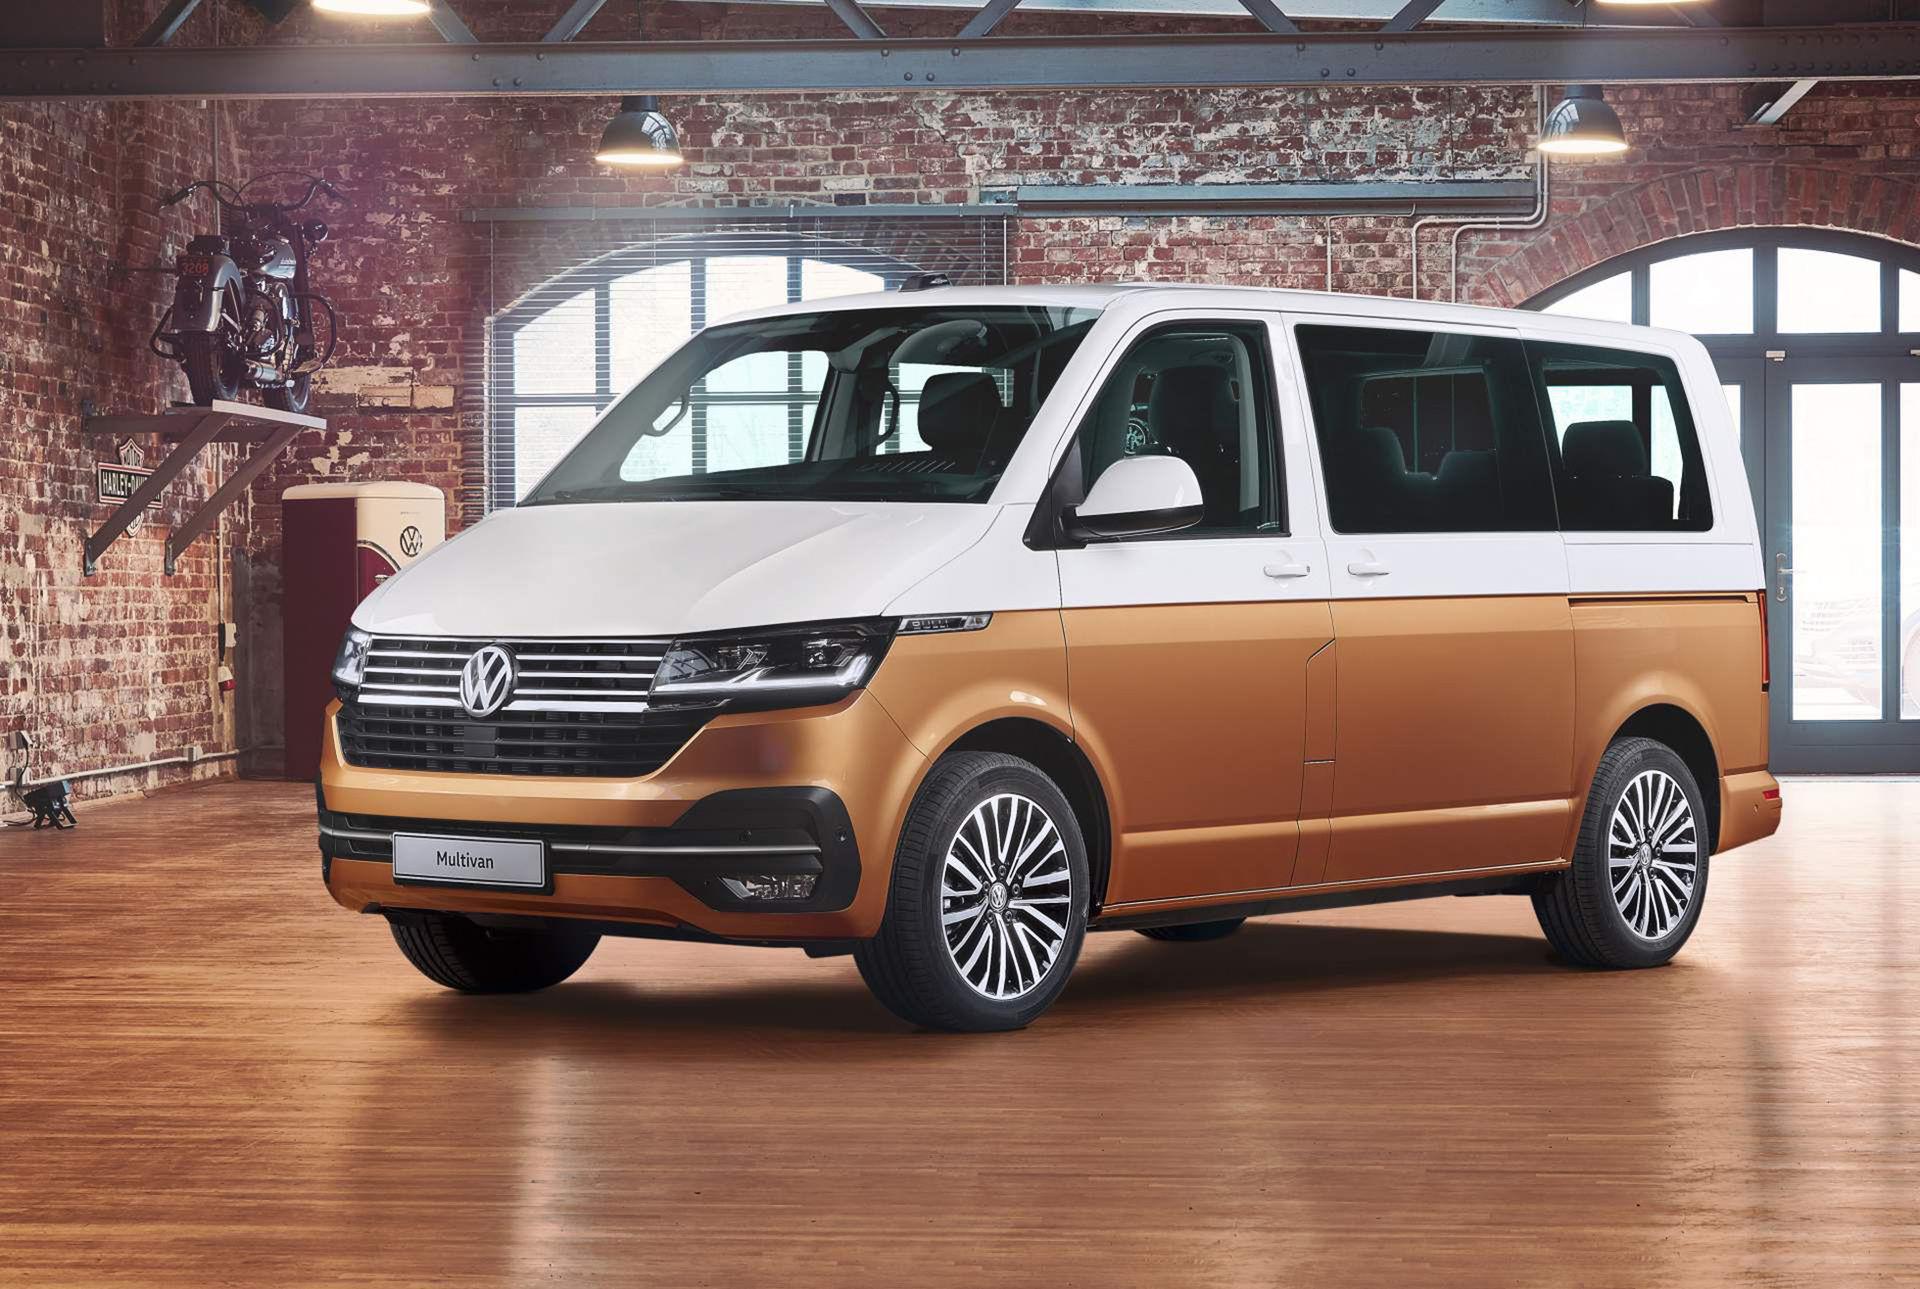 Volkswagen lyfter skåpbilen Multivan